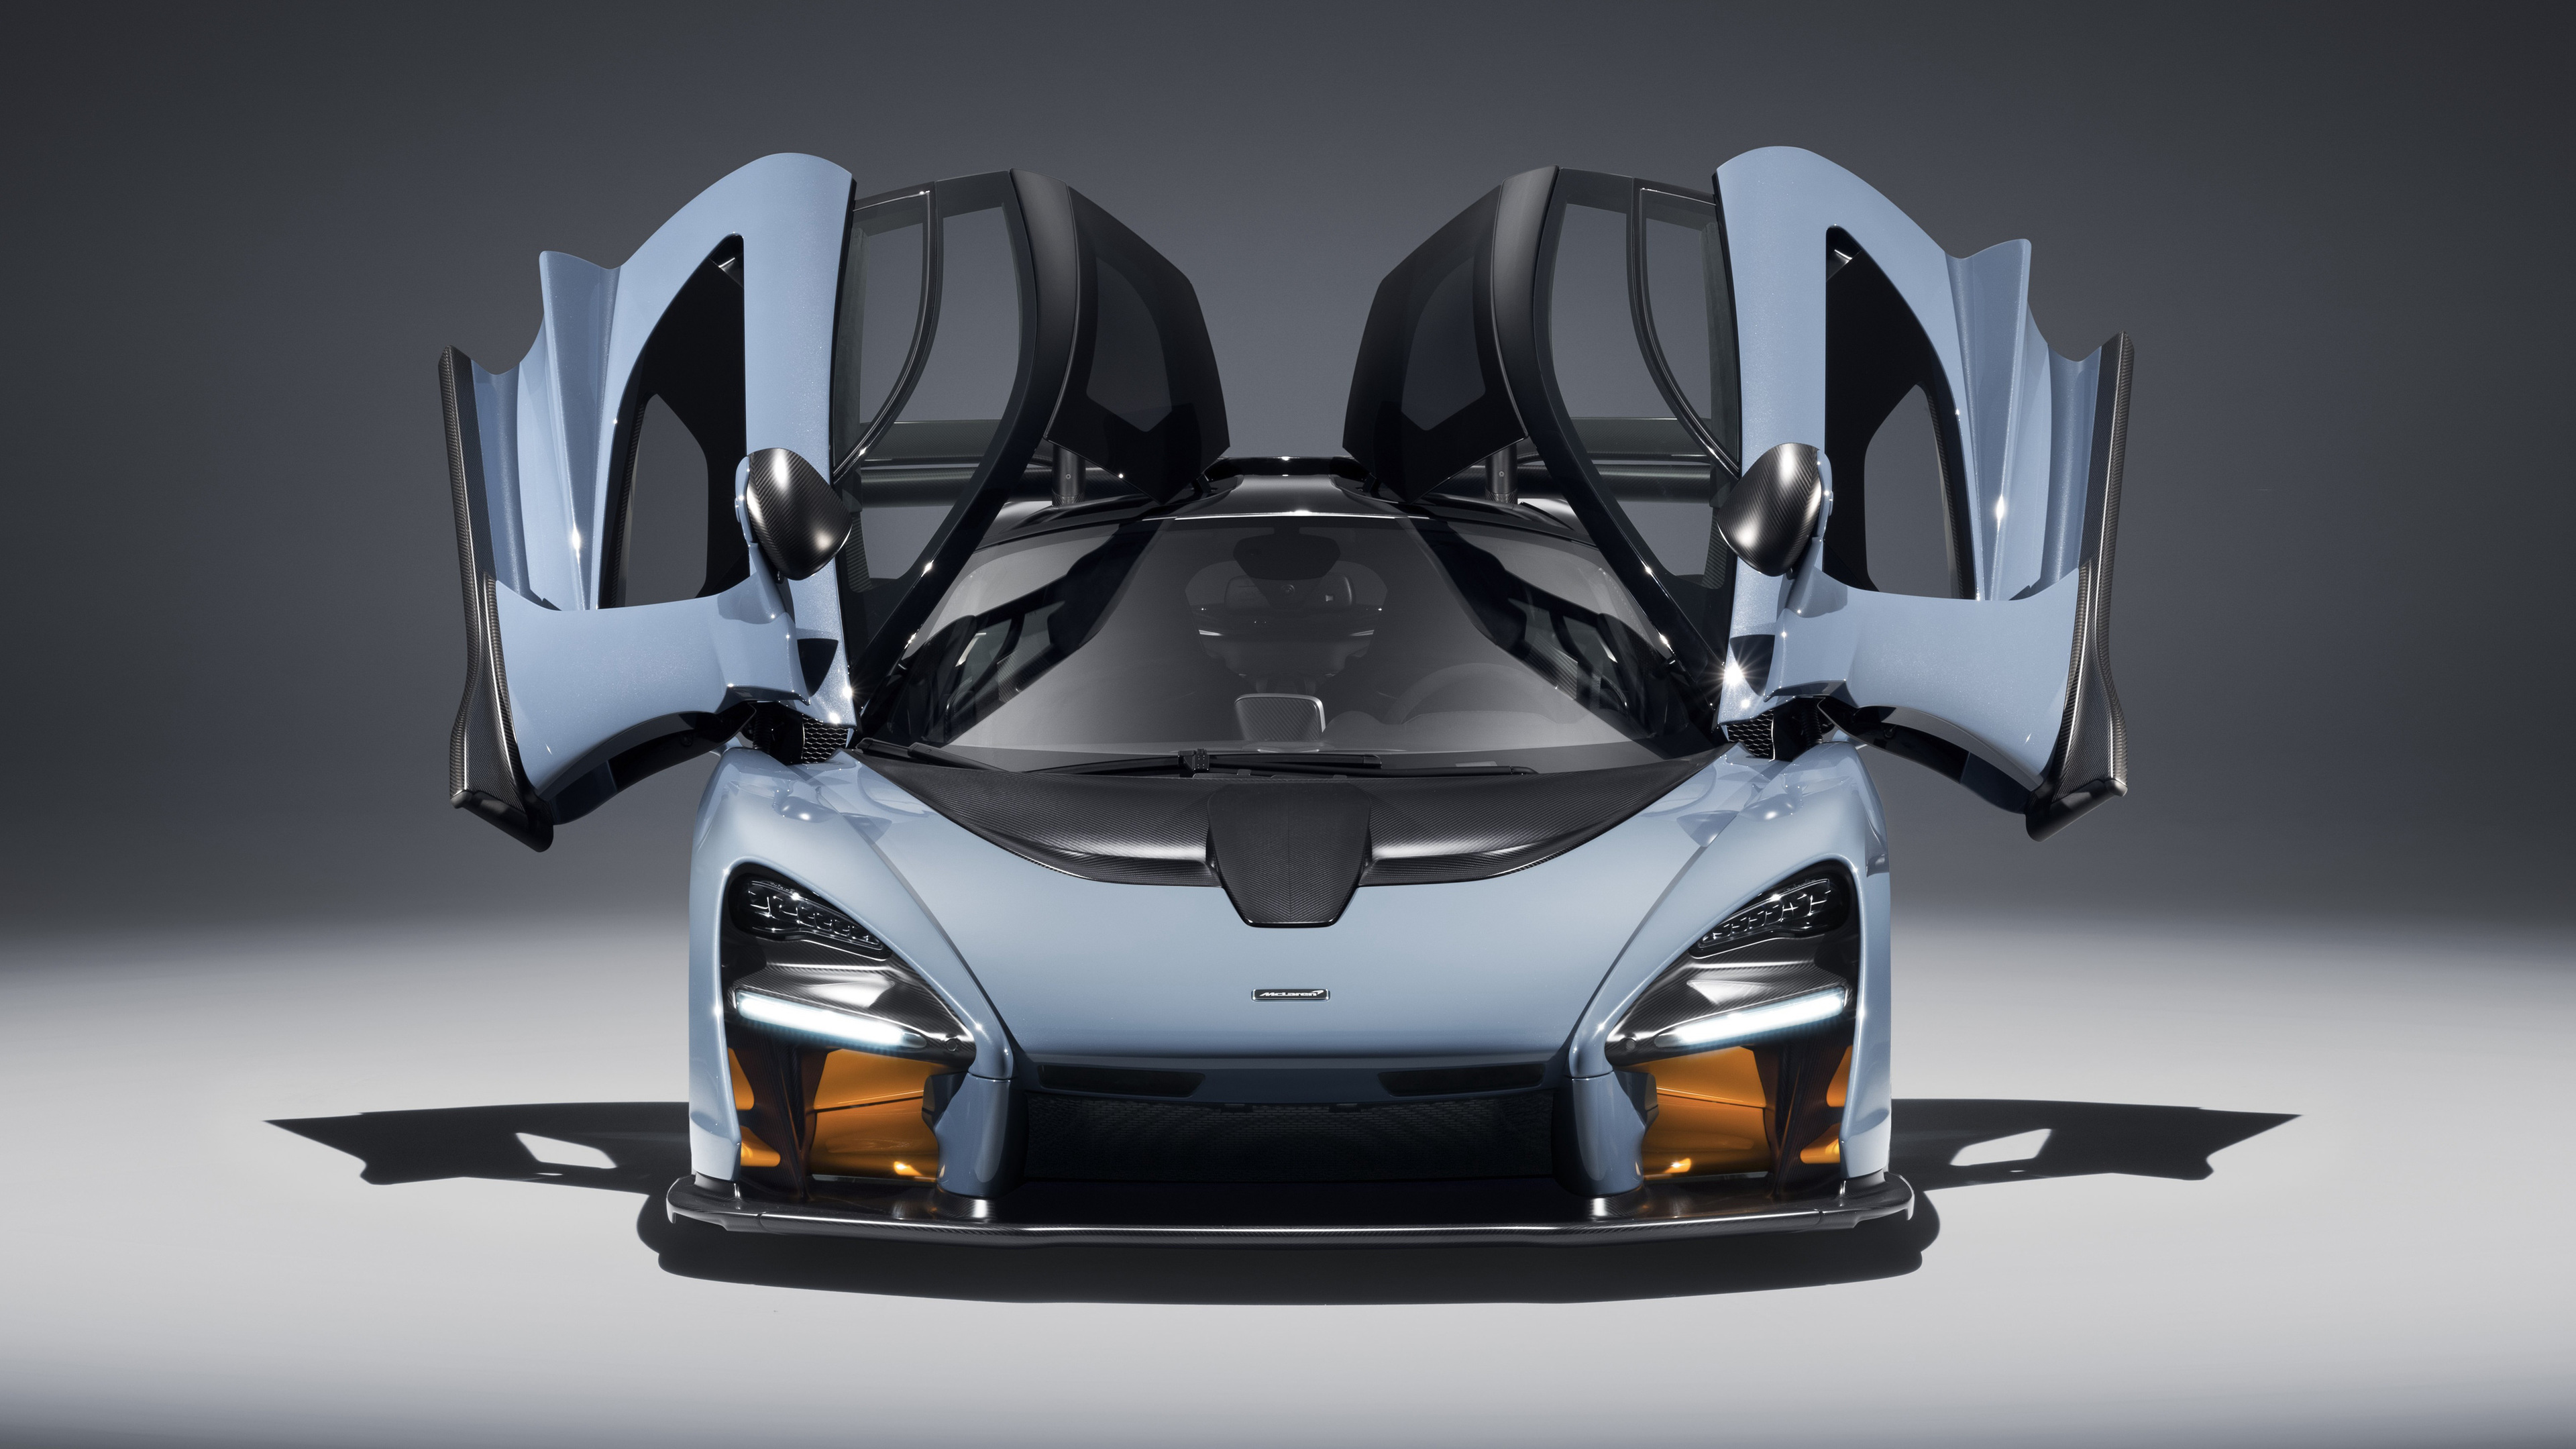 mclaren senna 2018 edition 1539109338 - McLaren Senna 2018 Edition - mclaren wallpapers, mclaren senna wallpapers, hd-wallpapers, cars wallpapers, 4k-wallpapers, 2018 cars wallpapers